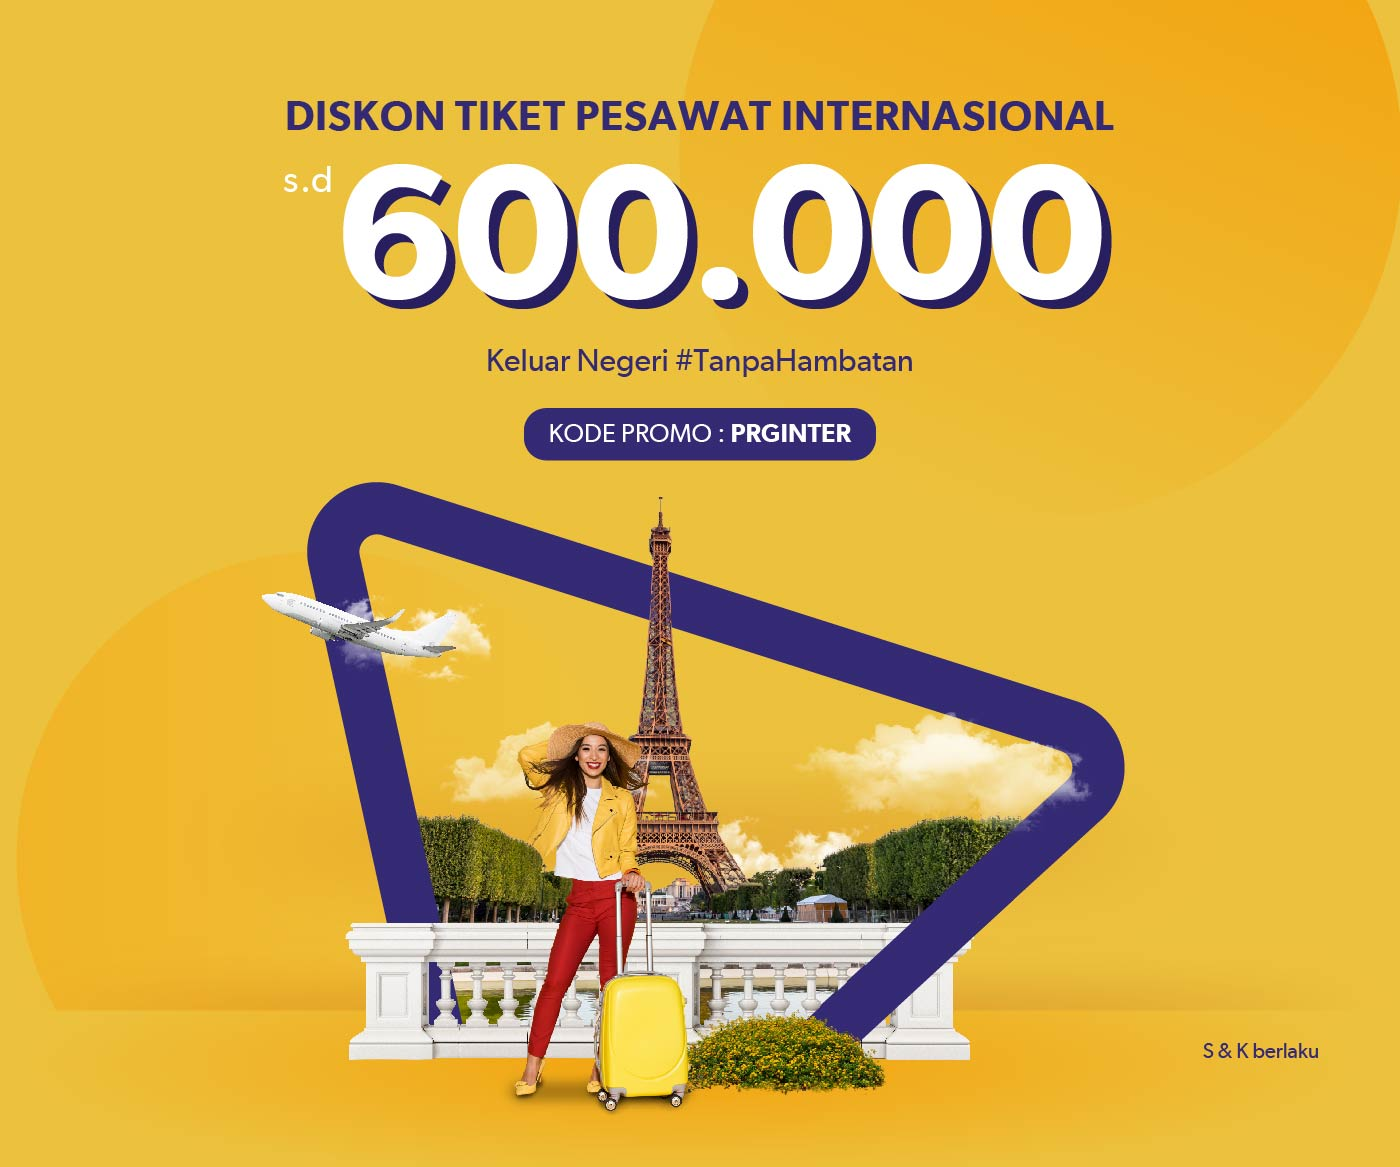 diskont tiket pesawat ke luar negeri